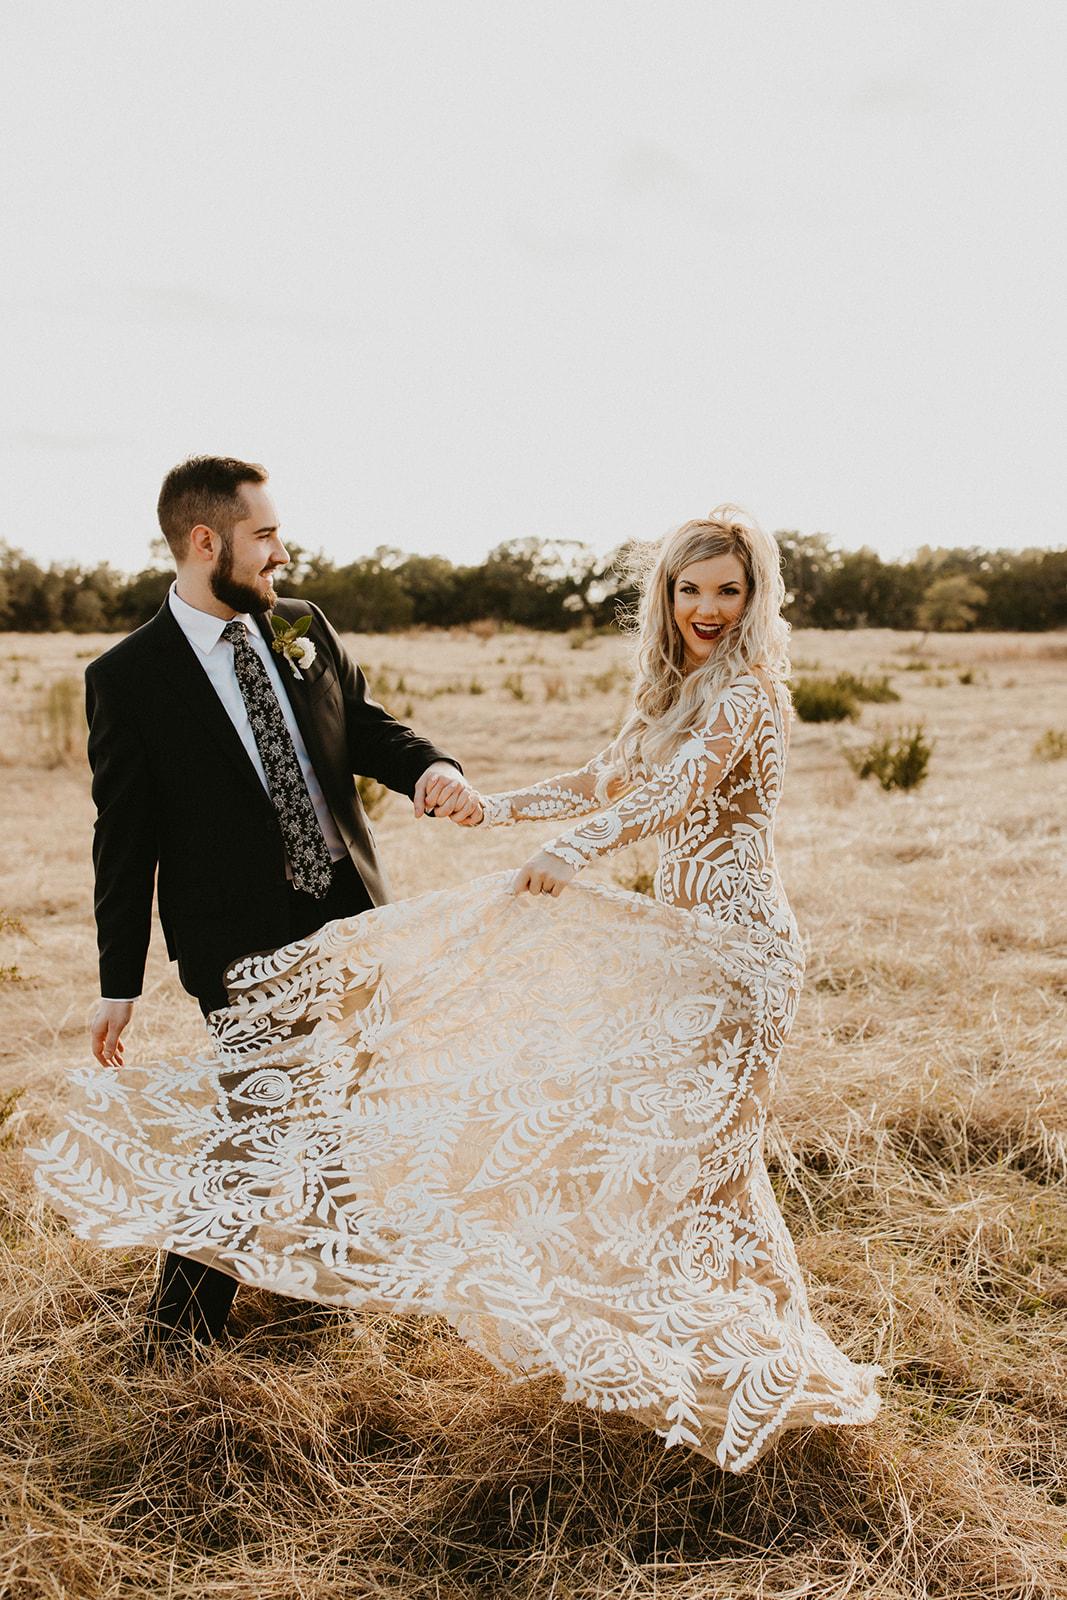 Epoch Co+ | Bride + Groom First Look Portraits | Austin Wedding Venue Prospect House | Adventure + Country + Outdoors + Moody + Bridal Hairstyle + Wedding Dress + Groom Attire  | Austin Wedding Photographer Century Tree Productions